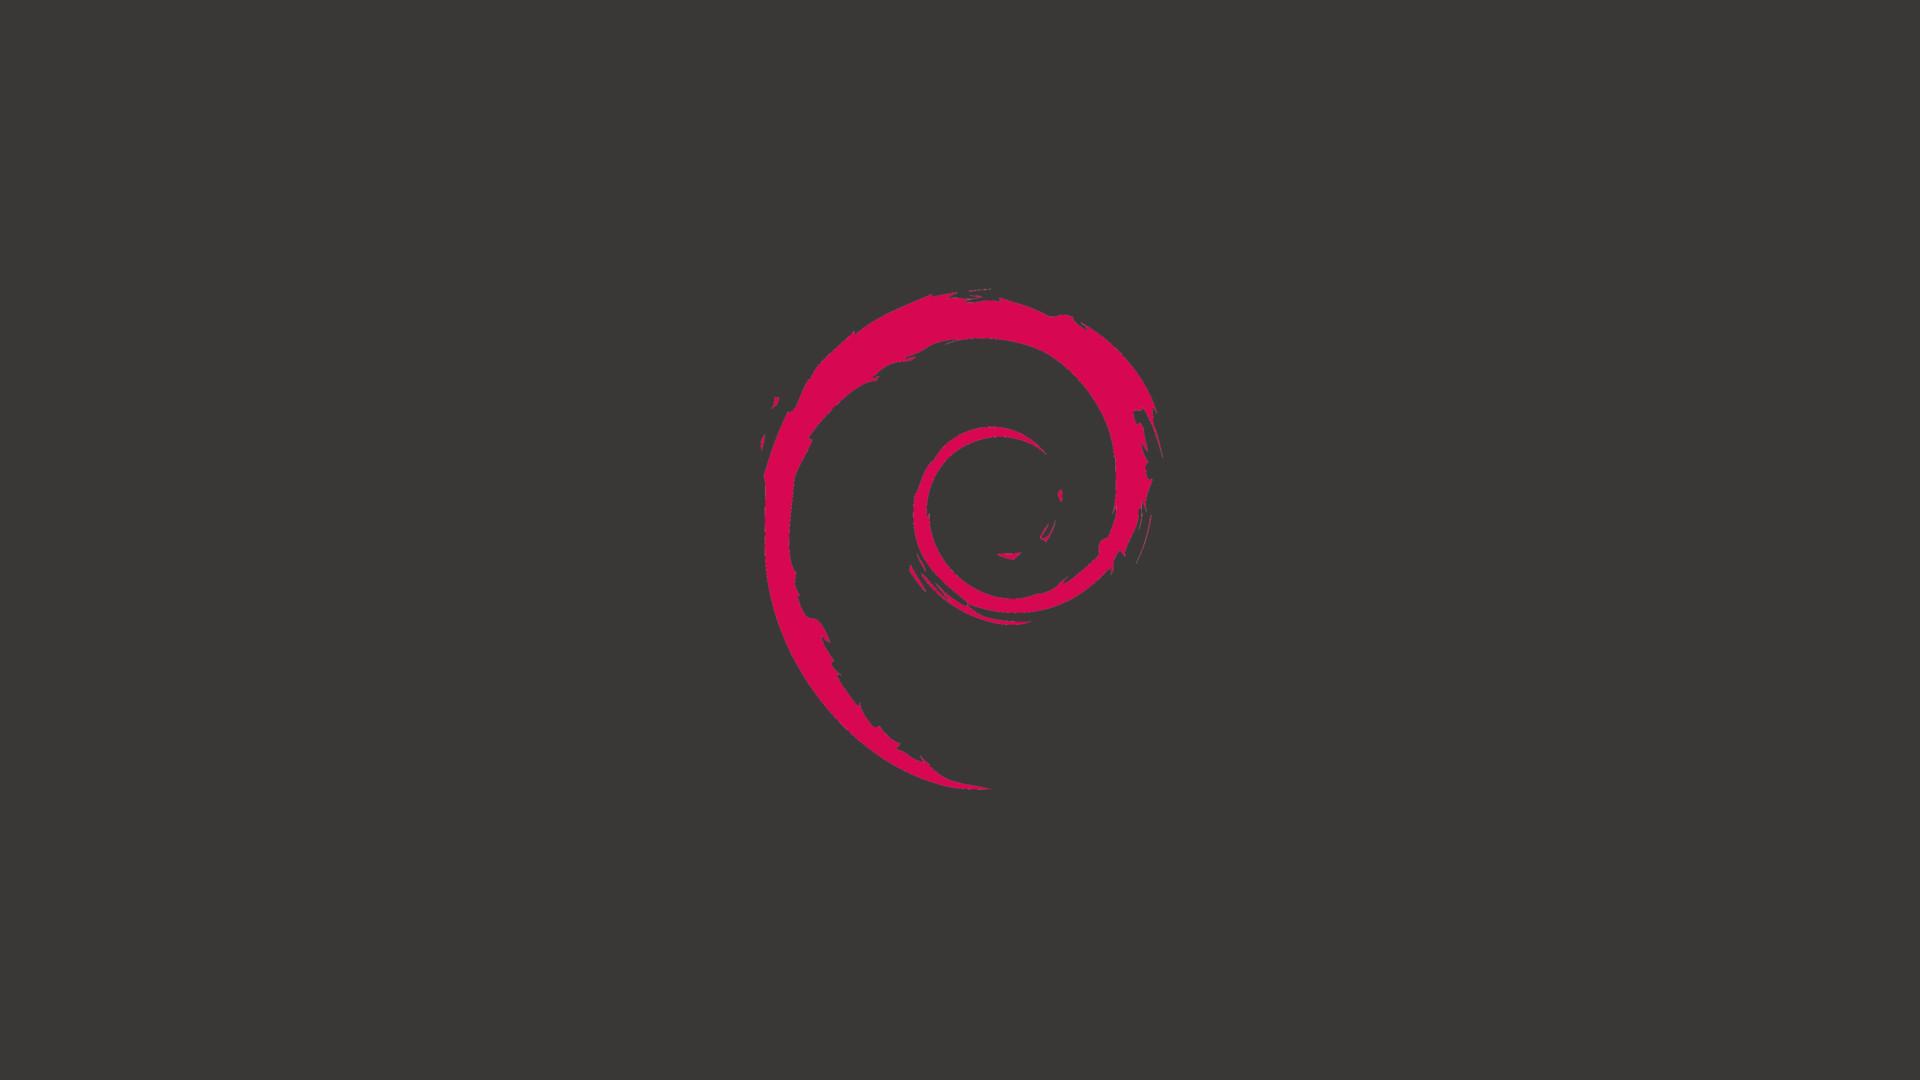 82 Debian Wallpapers on WallpaperPlay 1920x1080